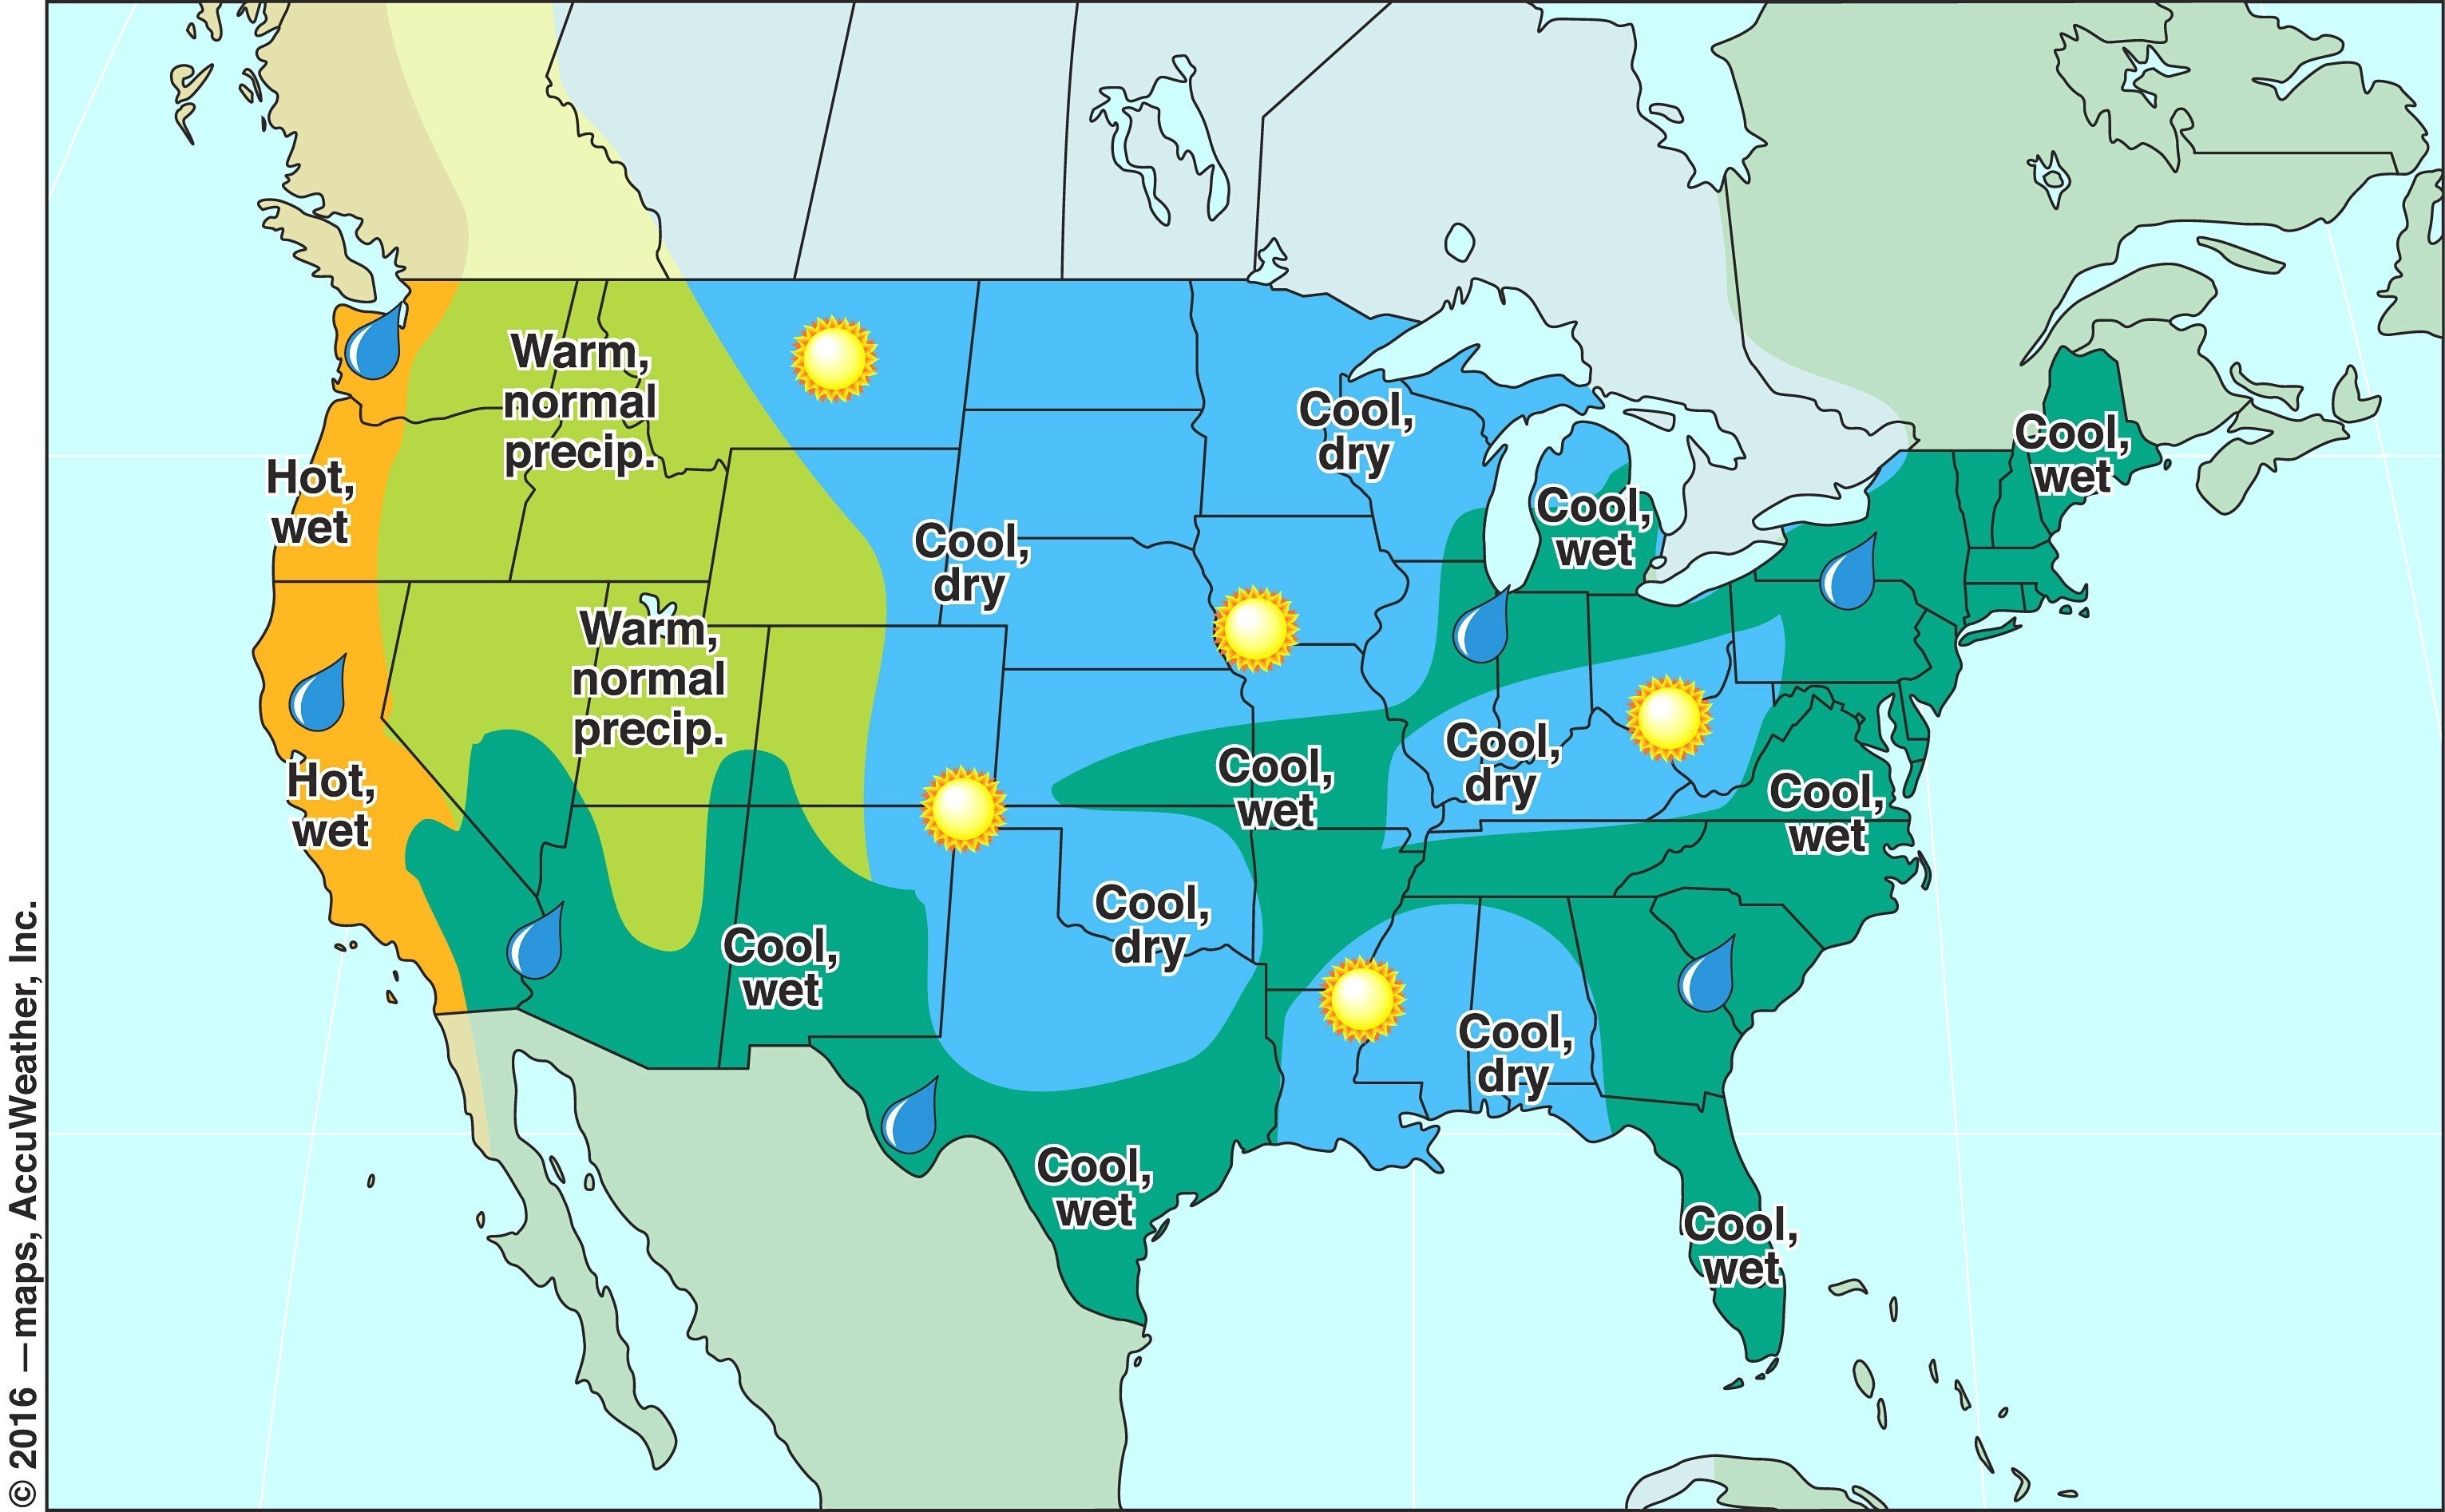 California Doppler Radar Map Fresh New Current Us Radar Weather Map - Current Weather Map California